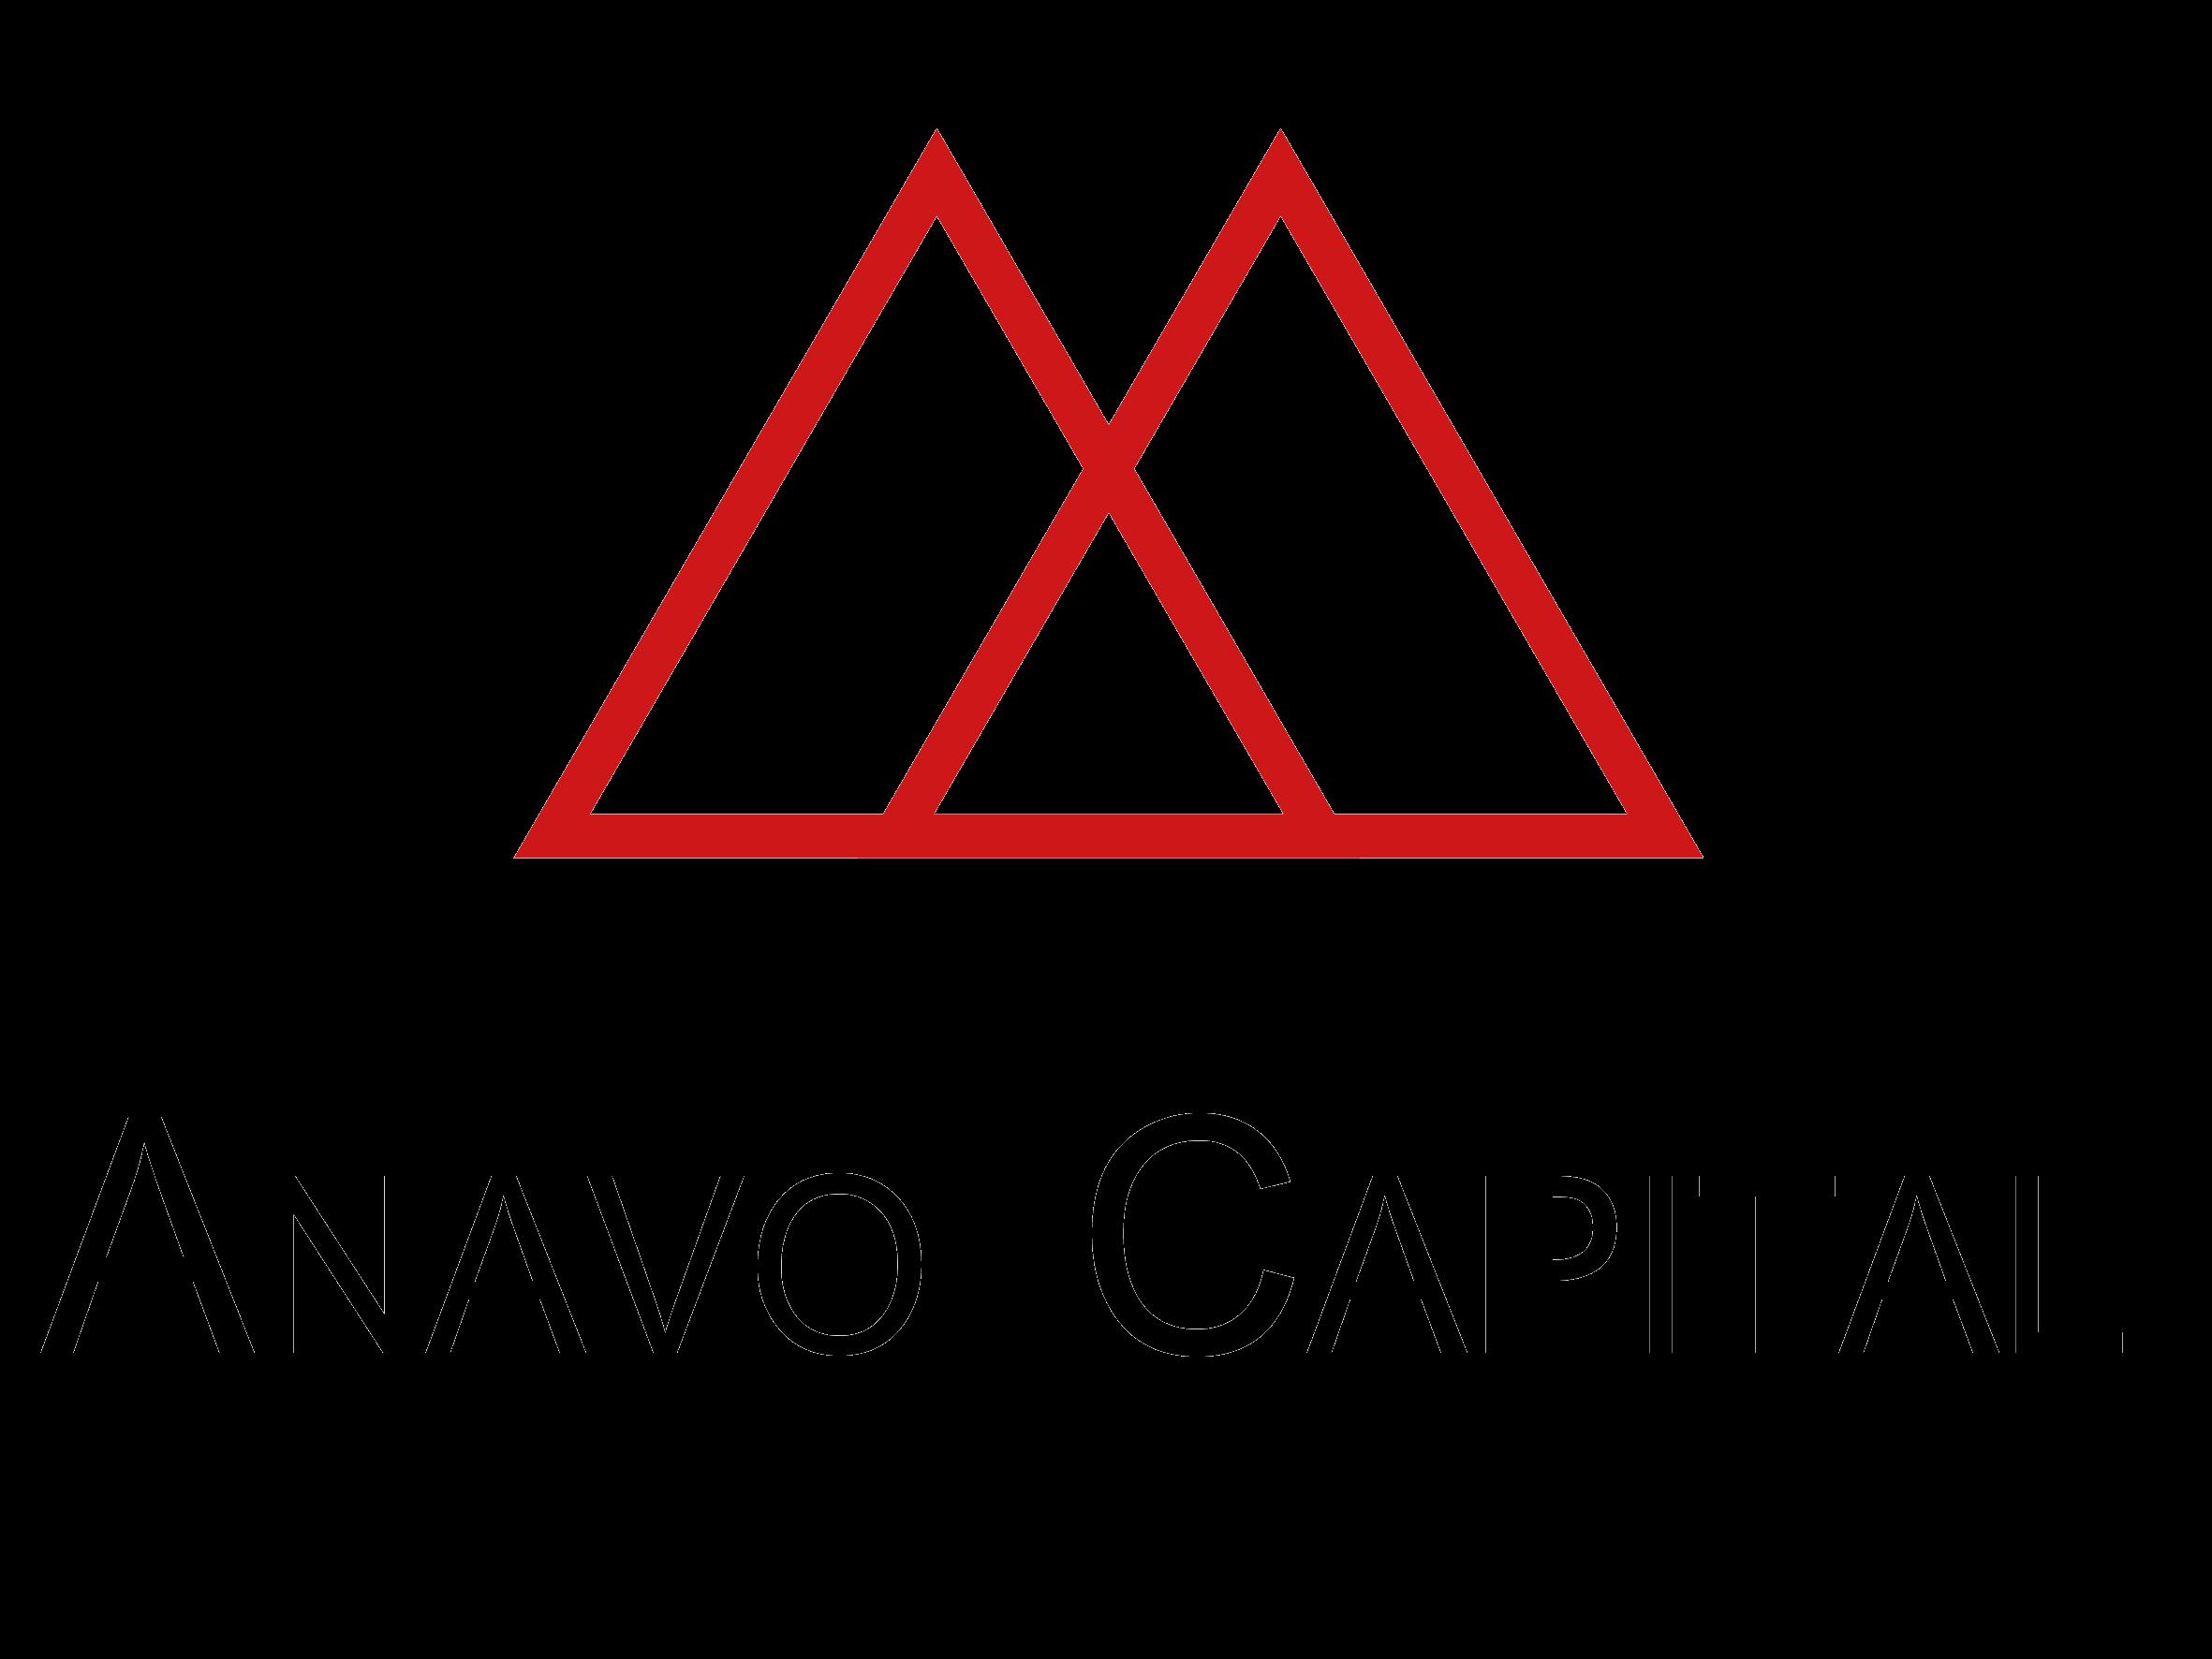 14. Anavo Capital Logo[1]